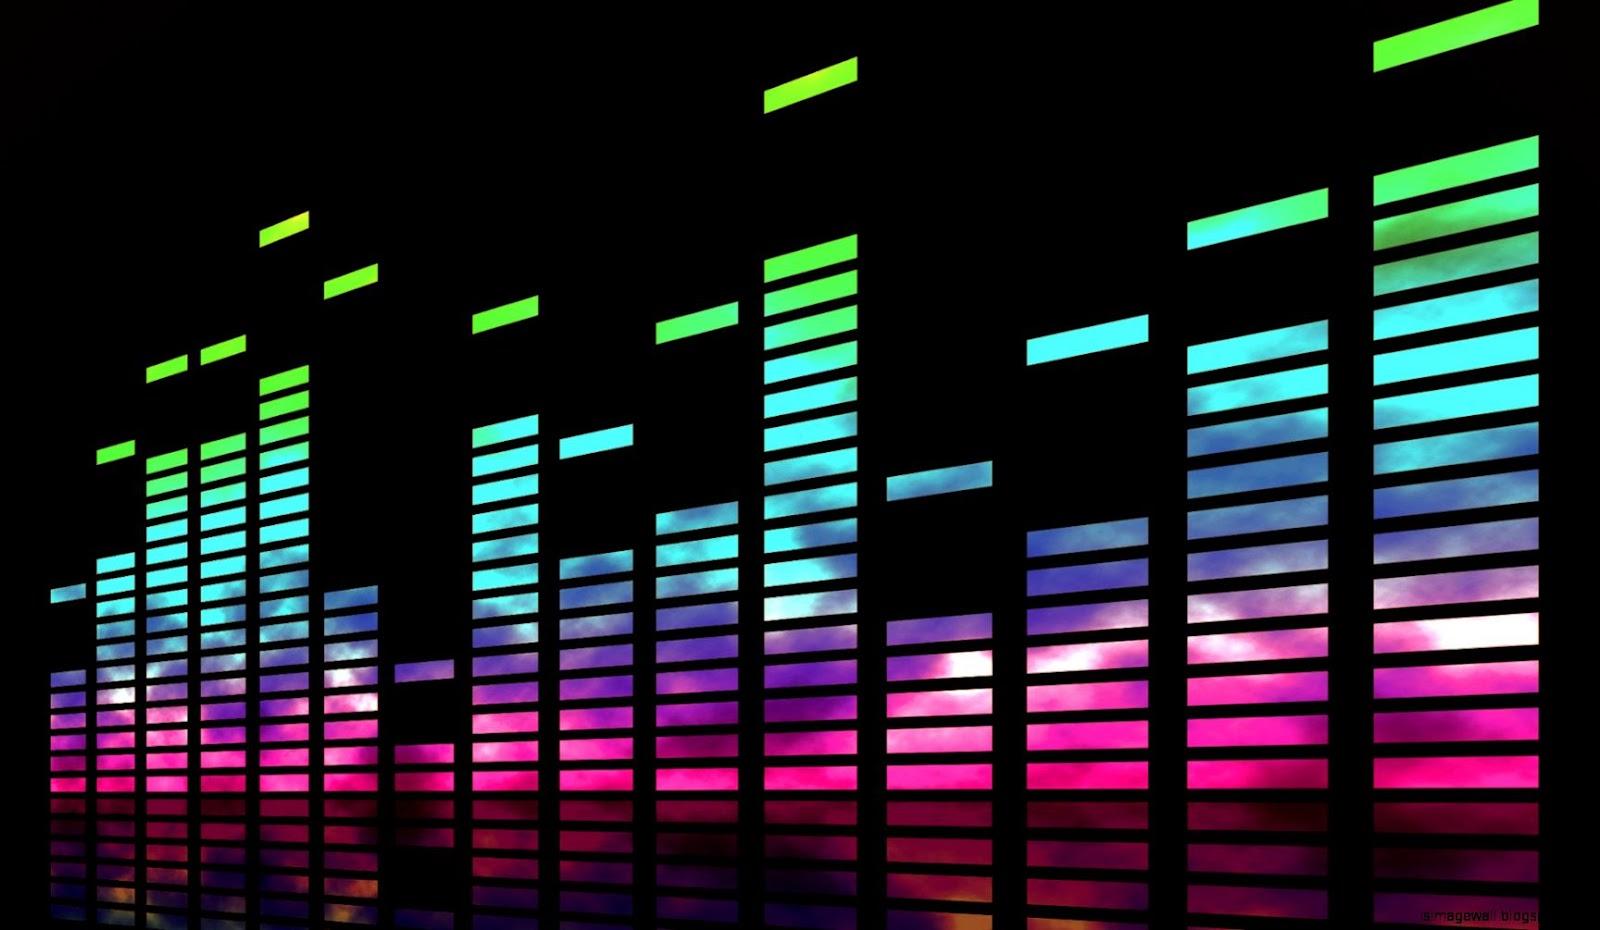 Music Bars Wallpaper: The Equalizer Wallpaper